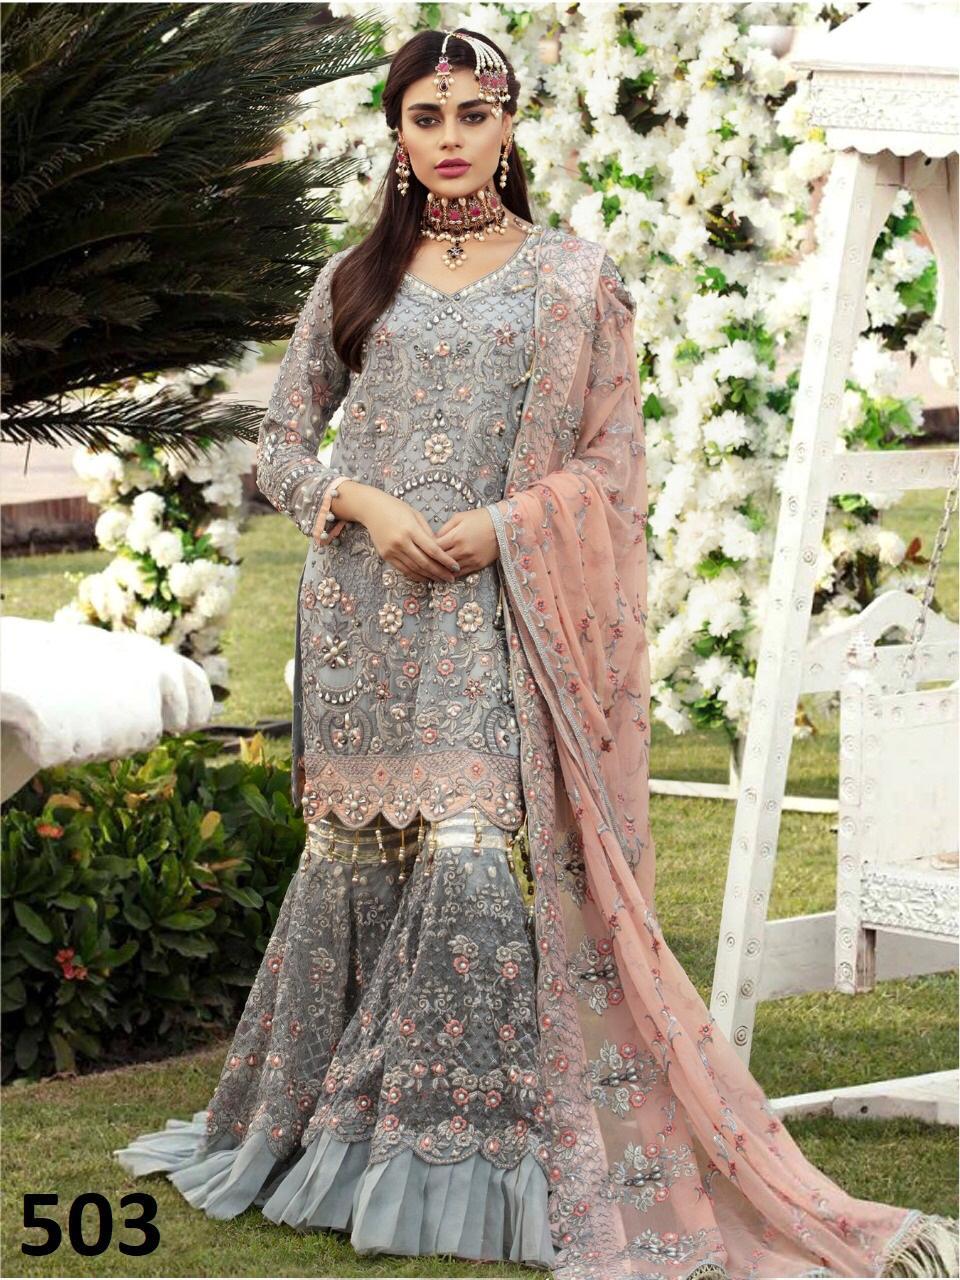 Pakistani Latest Gharara Styles with Long Shirts